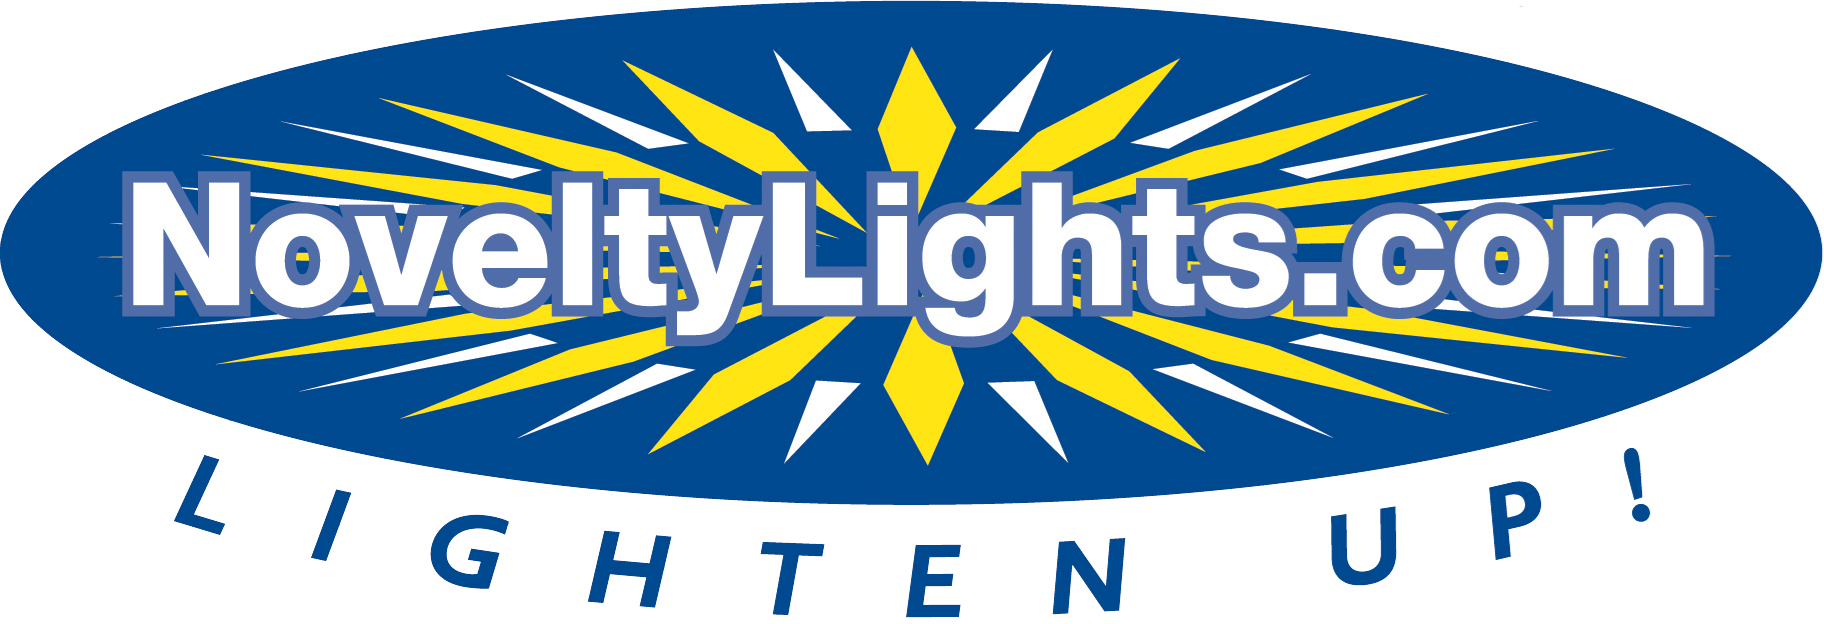 Novelty Lights, Inc.